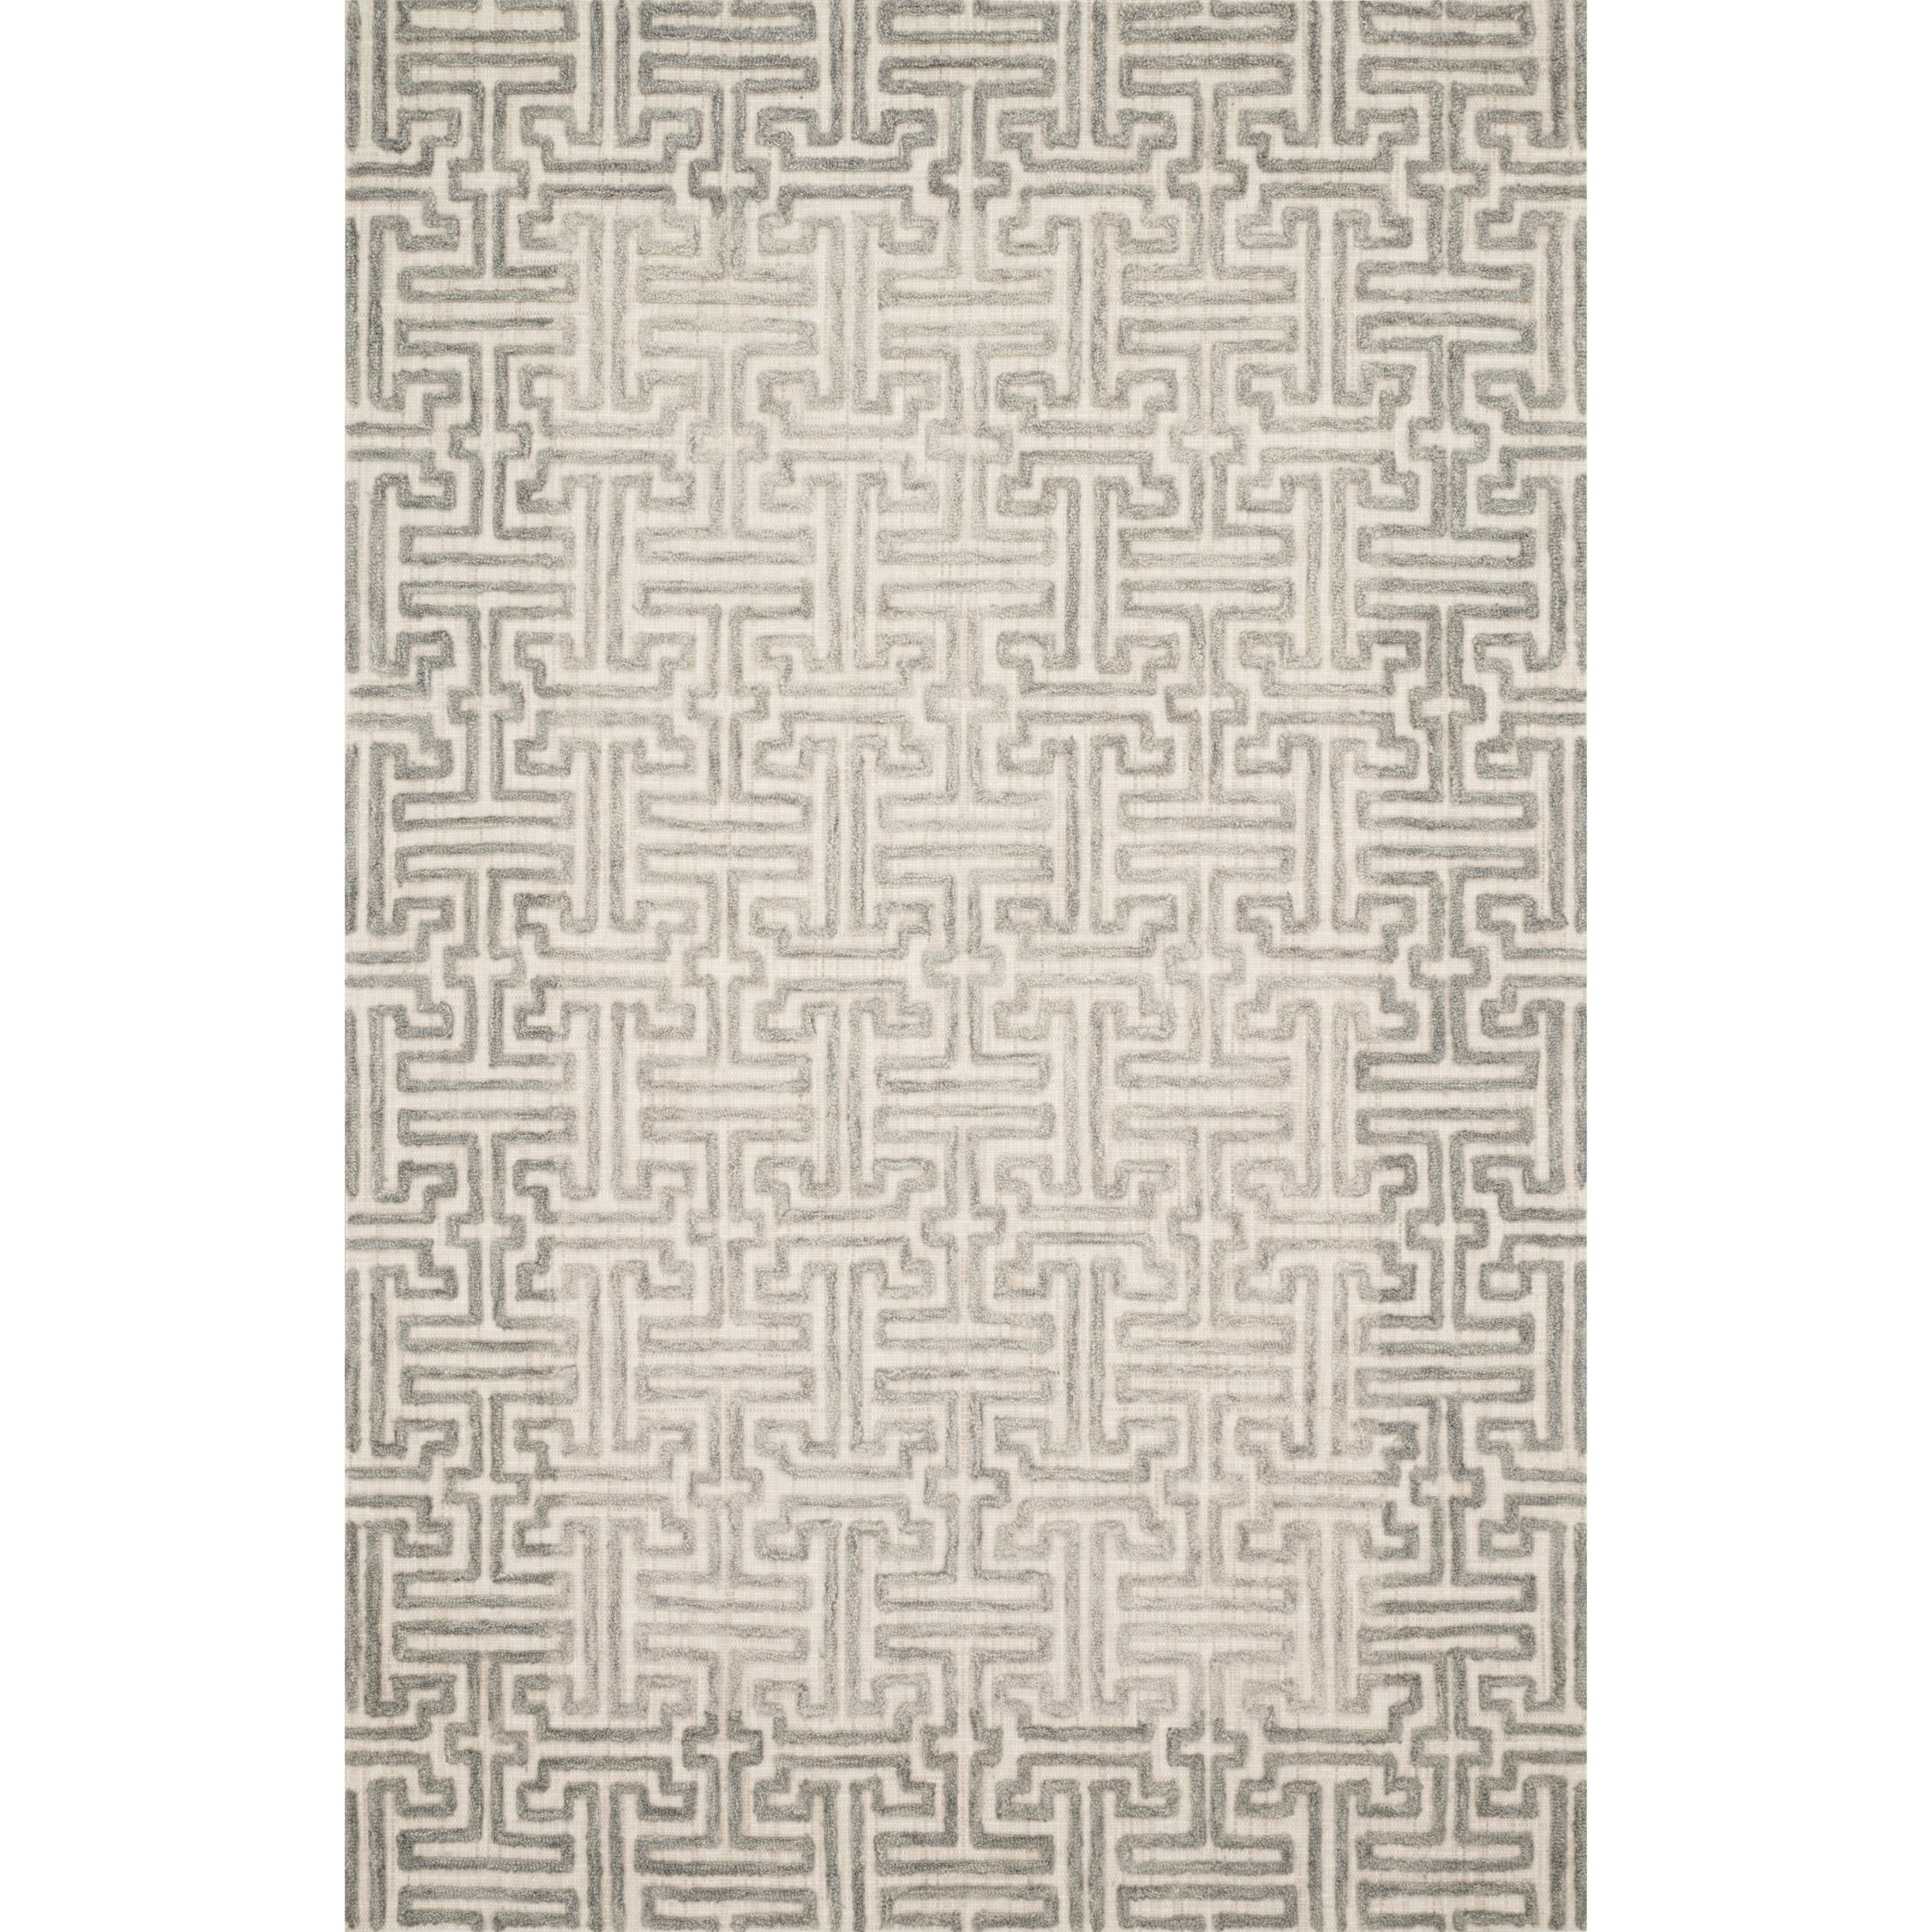 "Ehren 11'6"" x 15' Stone / Sand Rug by Loloi Rugs at Virginia Furniture Market"